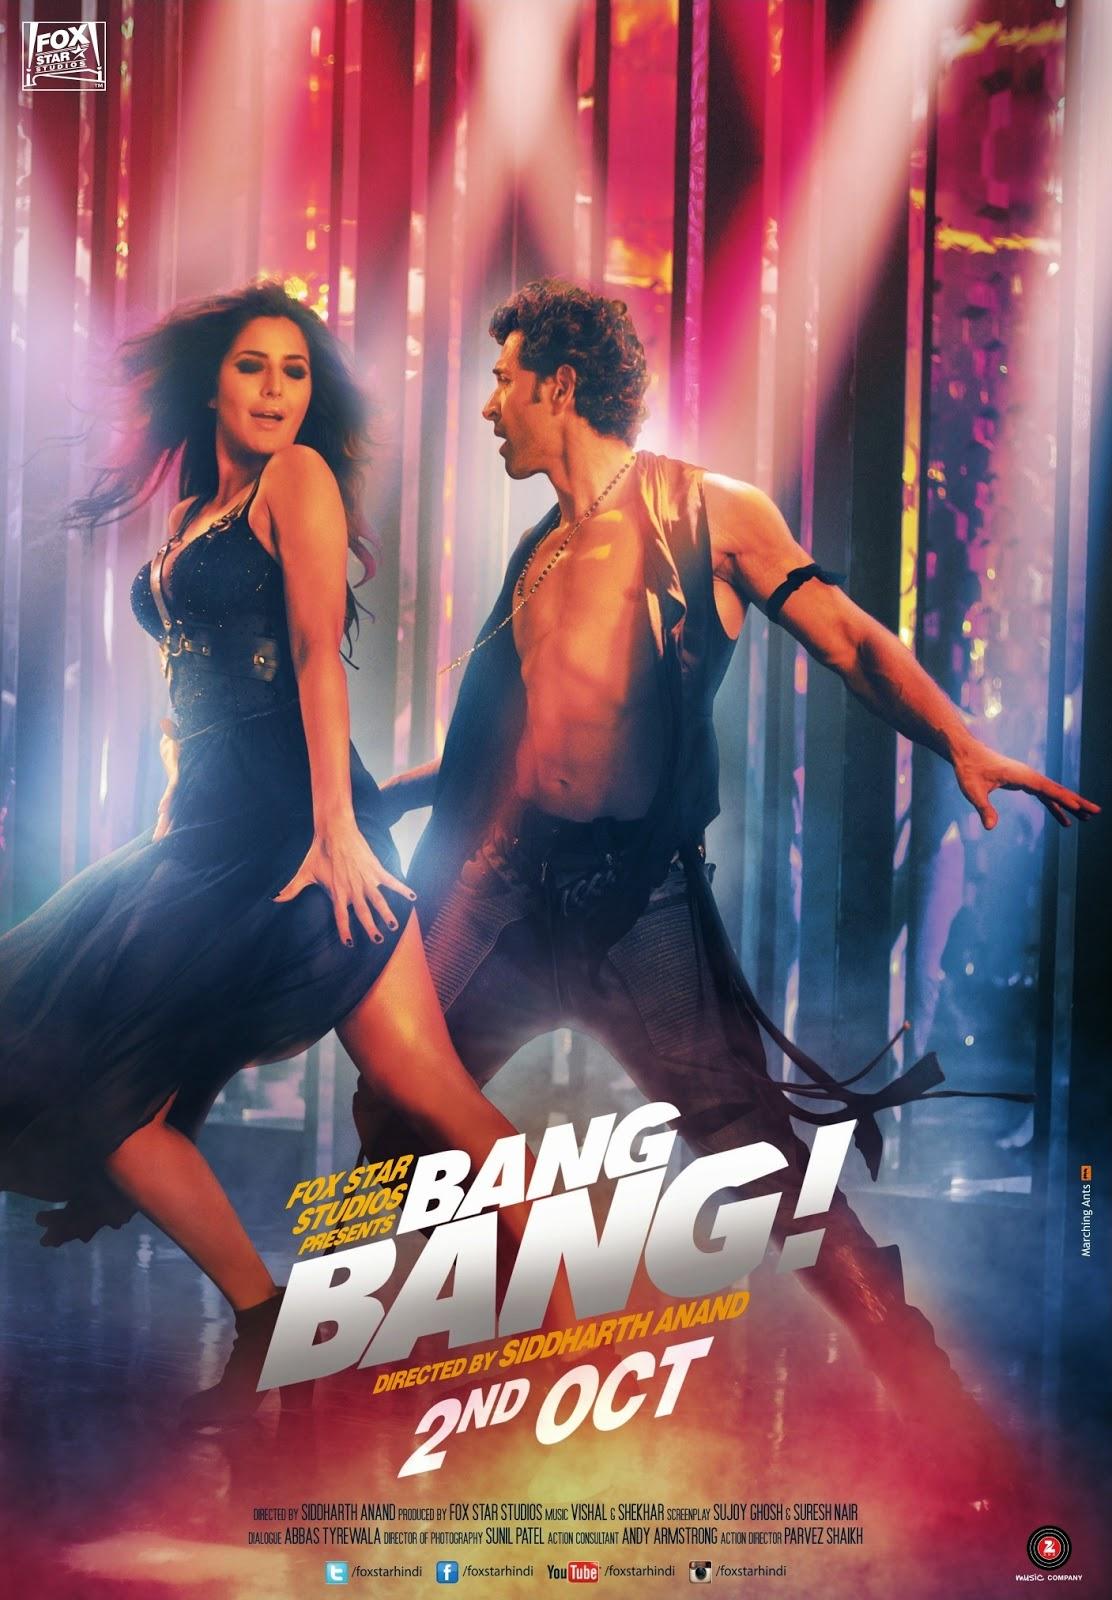 Bang bang bang mp3 скачать бесплатно